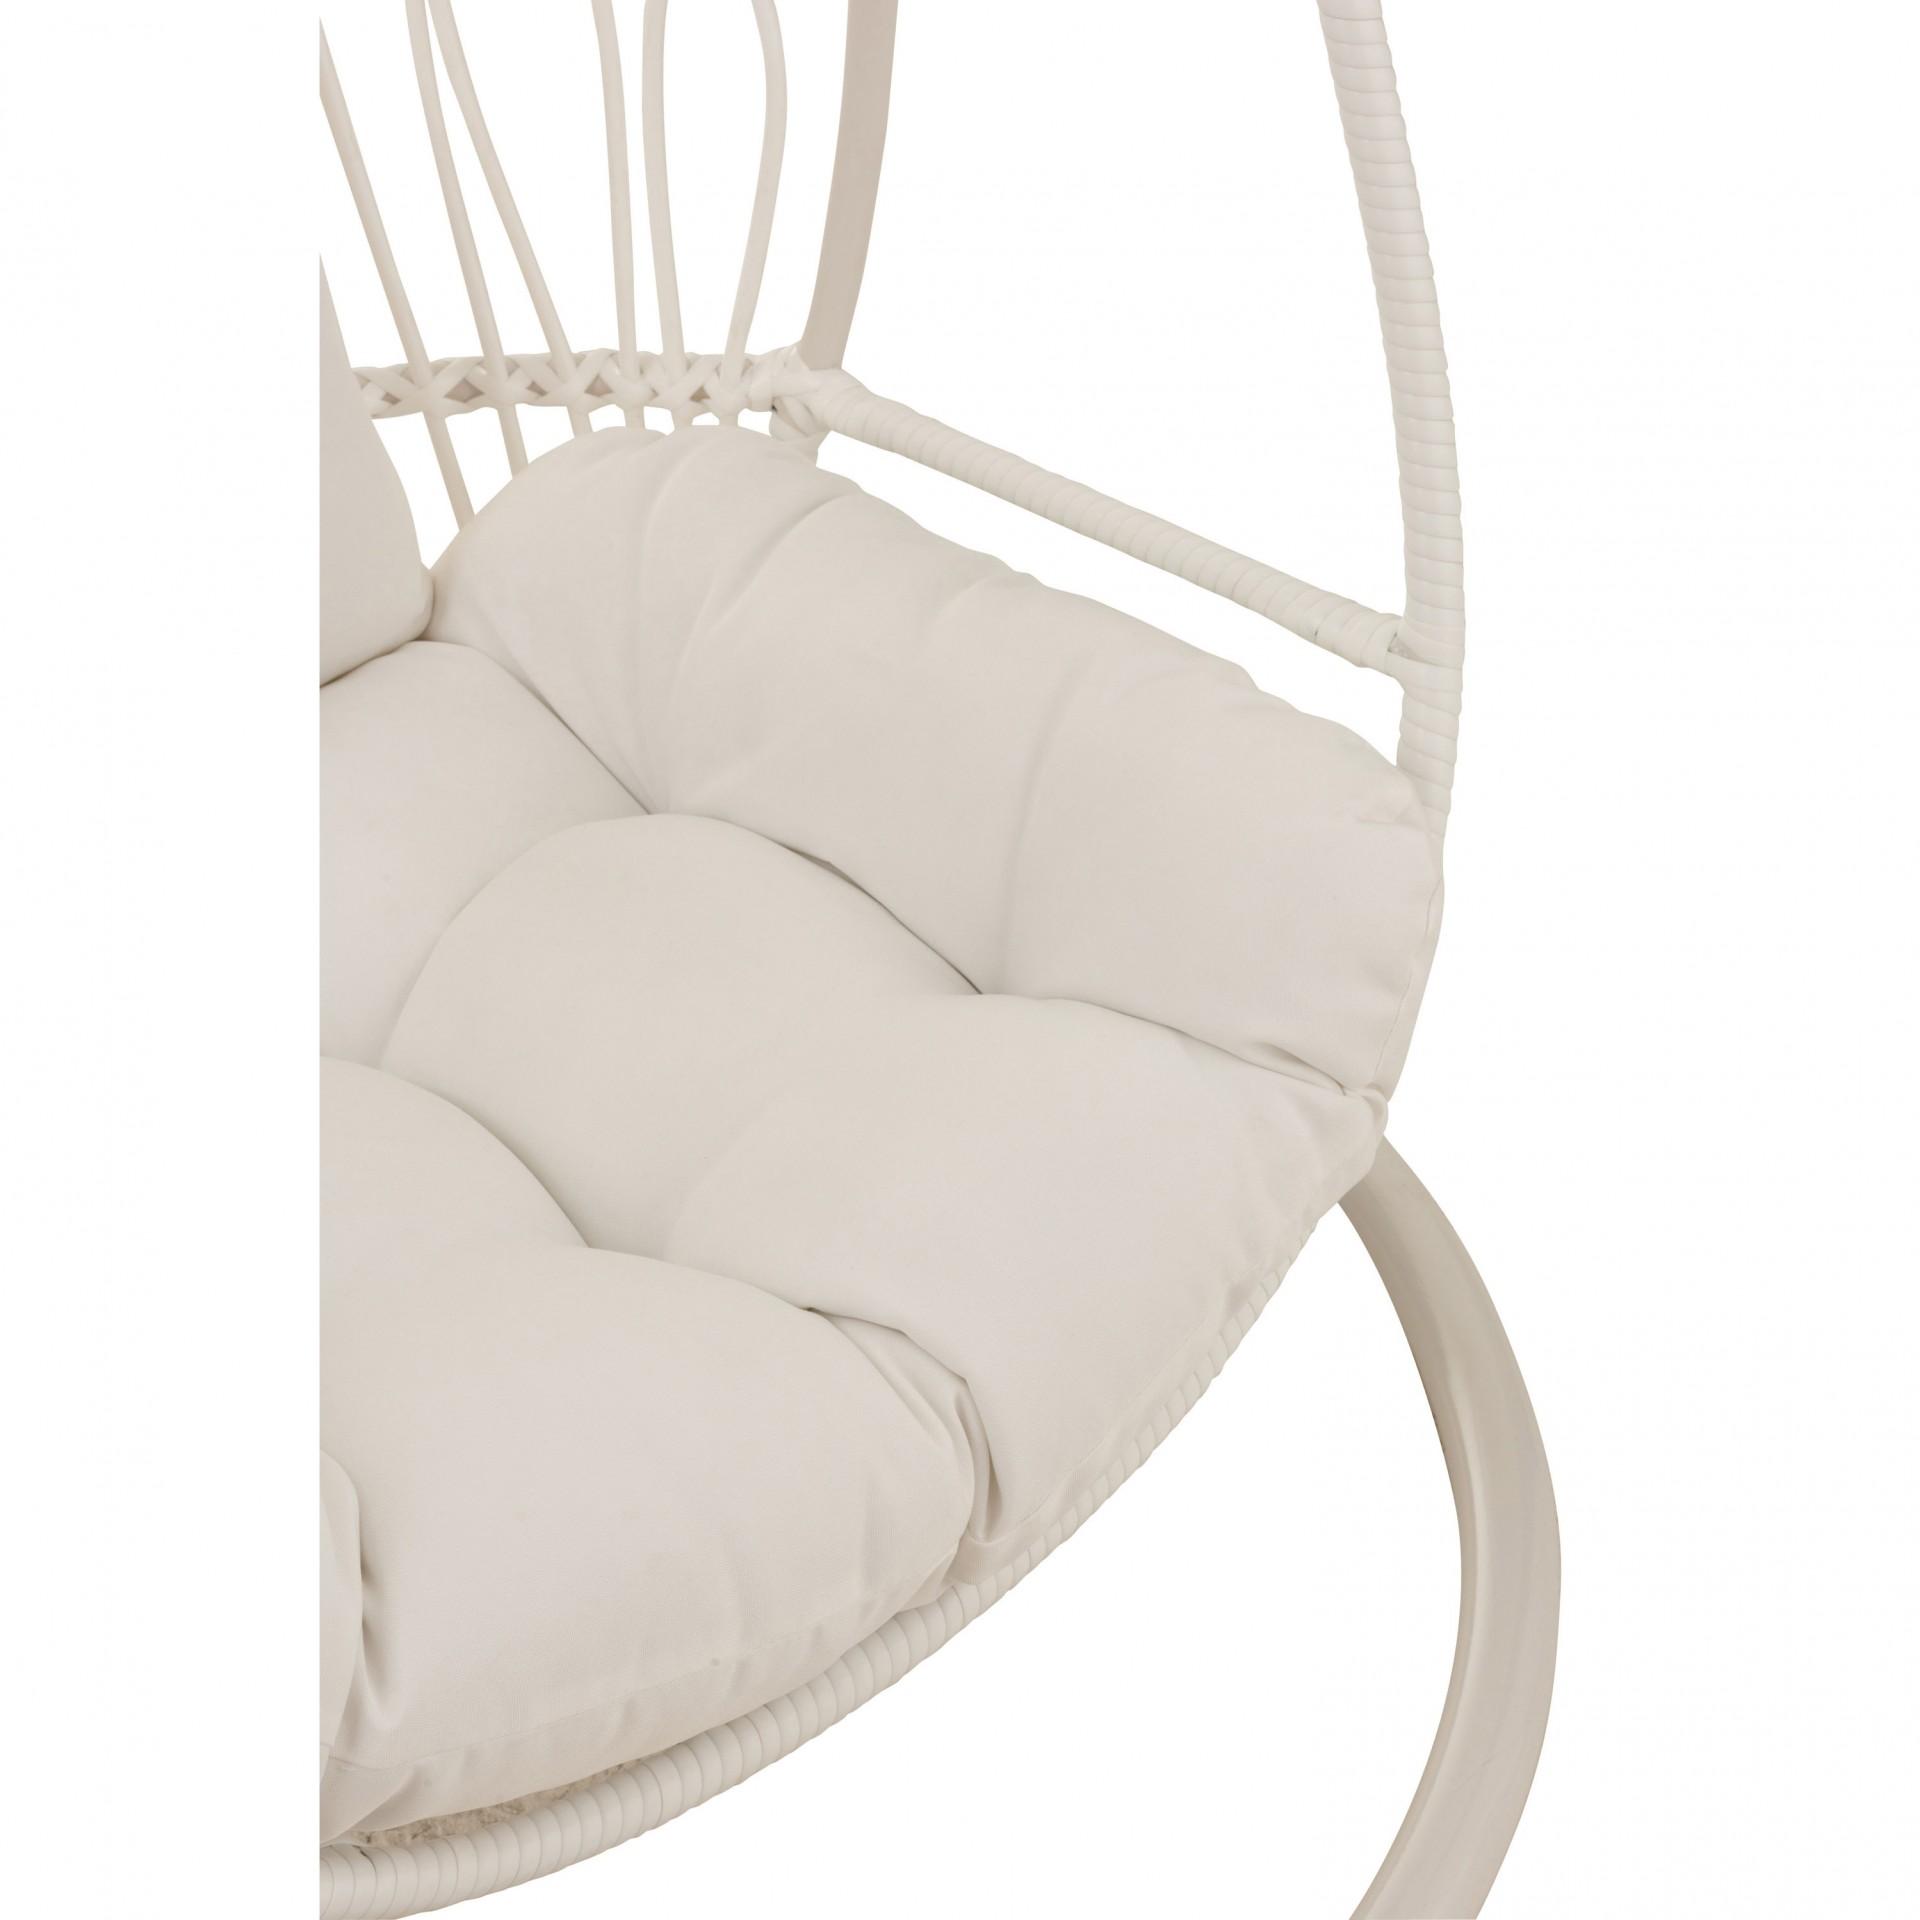 Cadeira suspensa infantil, metal/vime, branco, 103x93x155